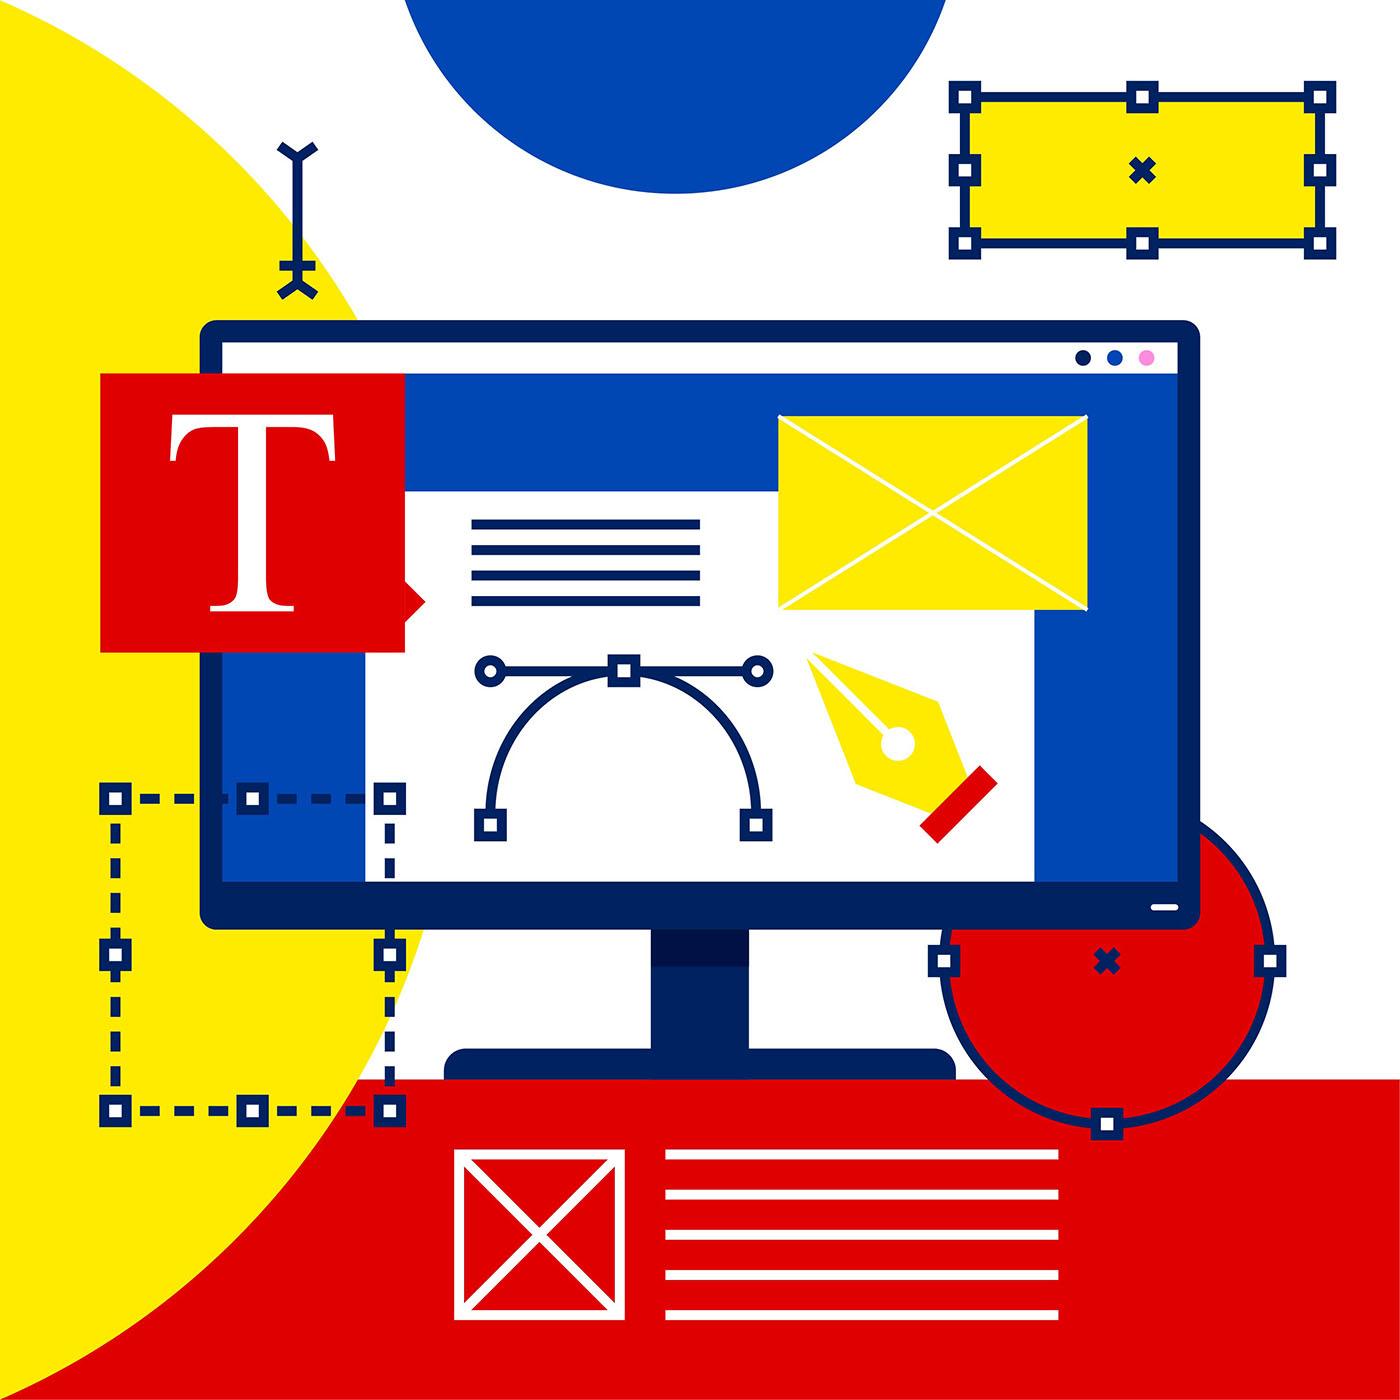 Graphic Design Software Illustration Vector